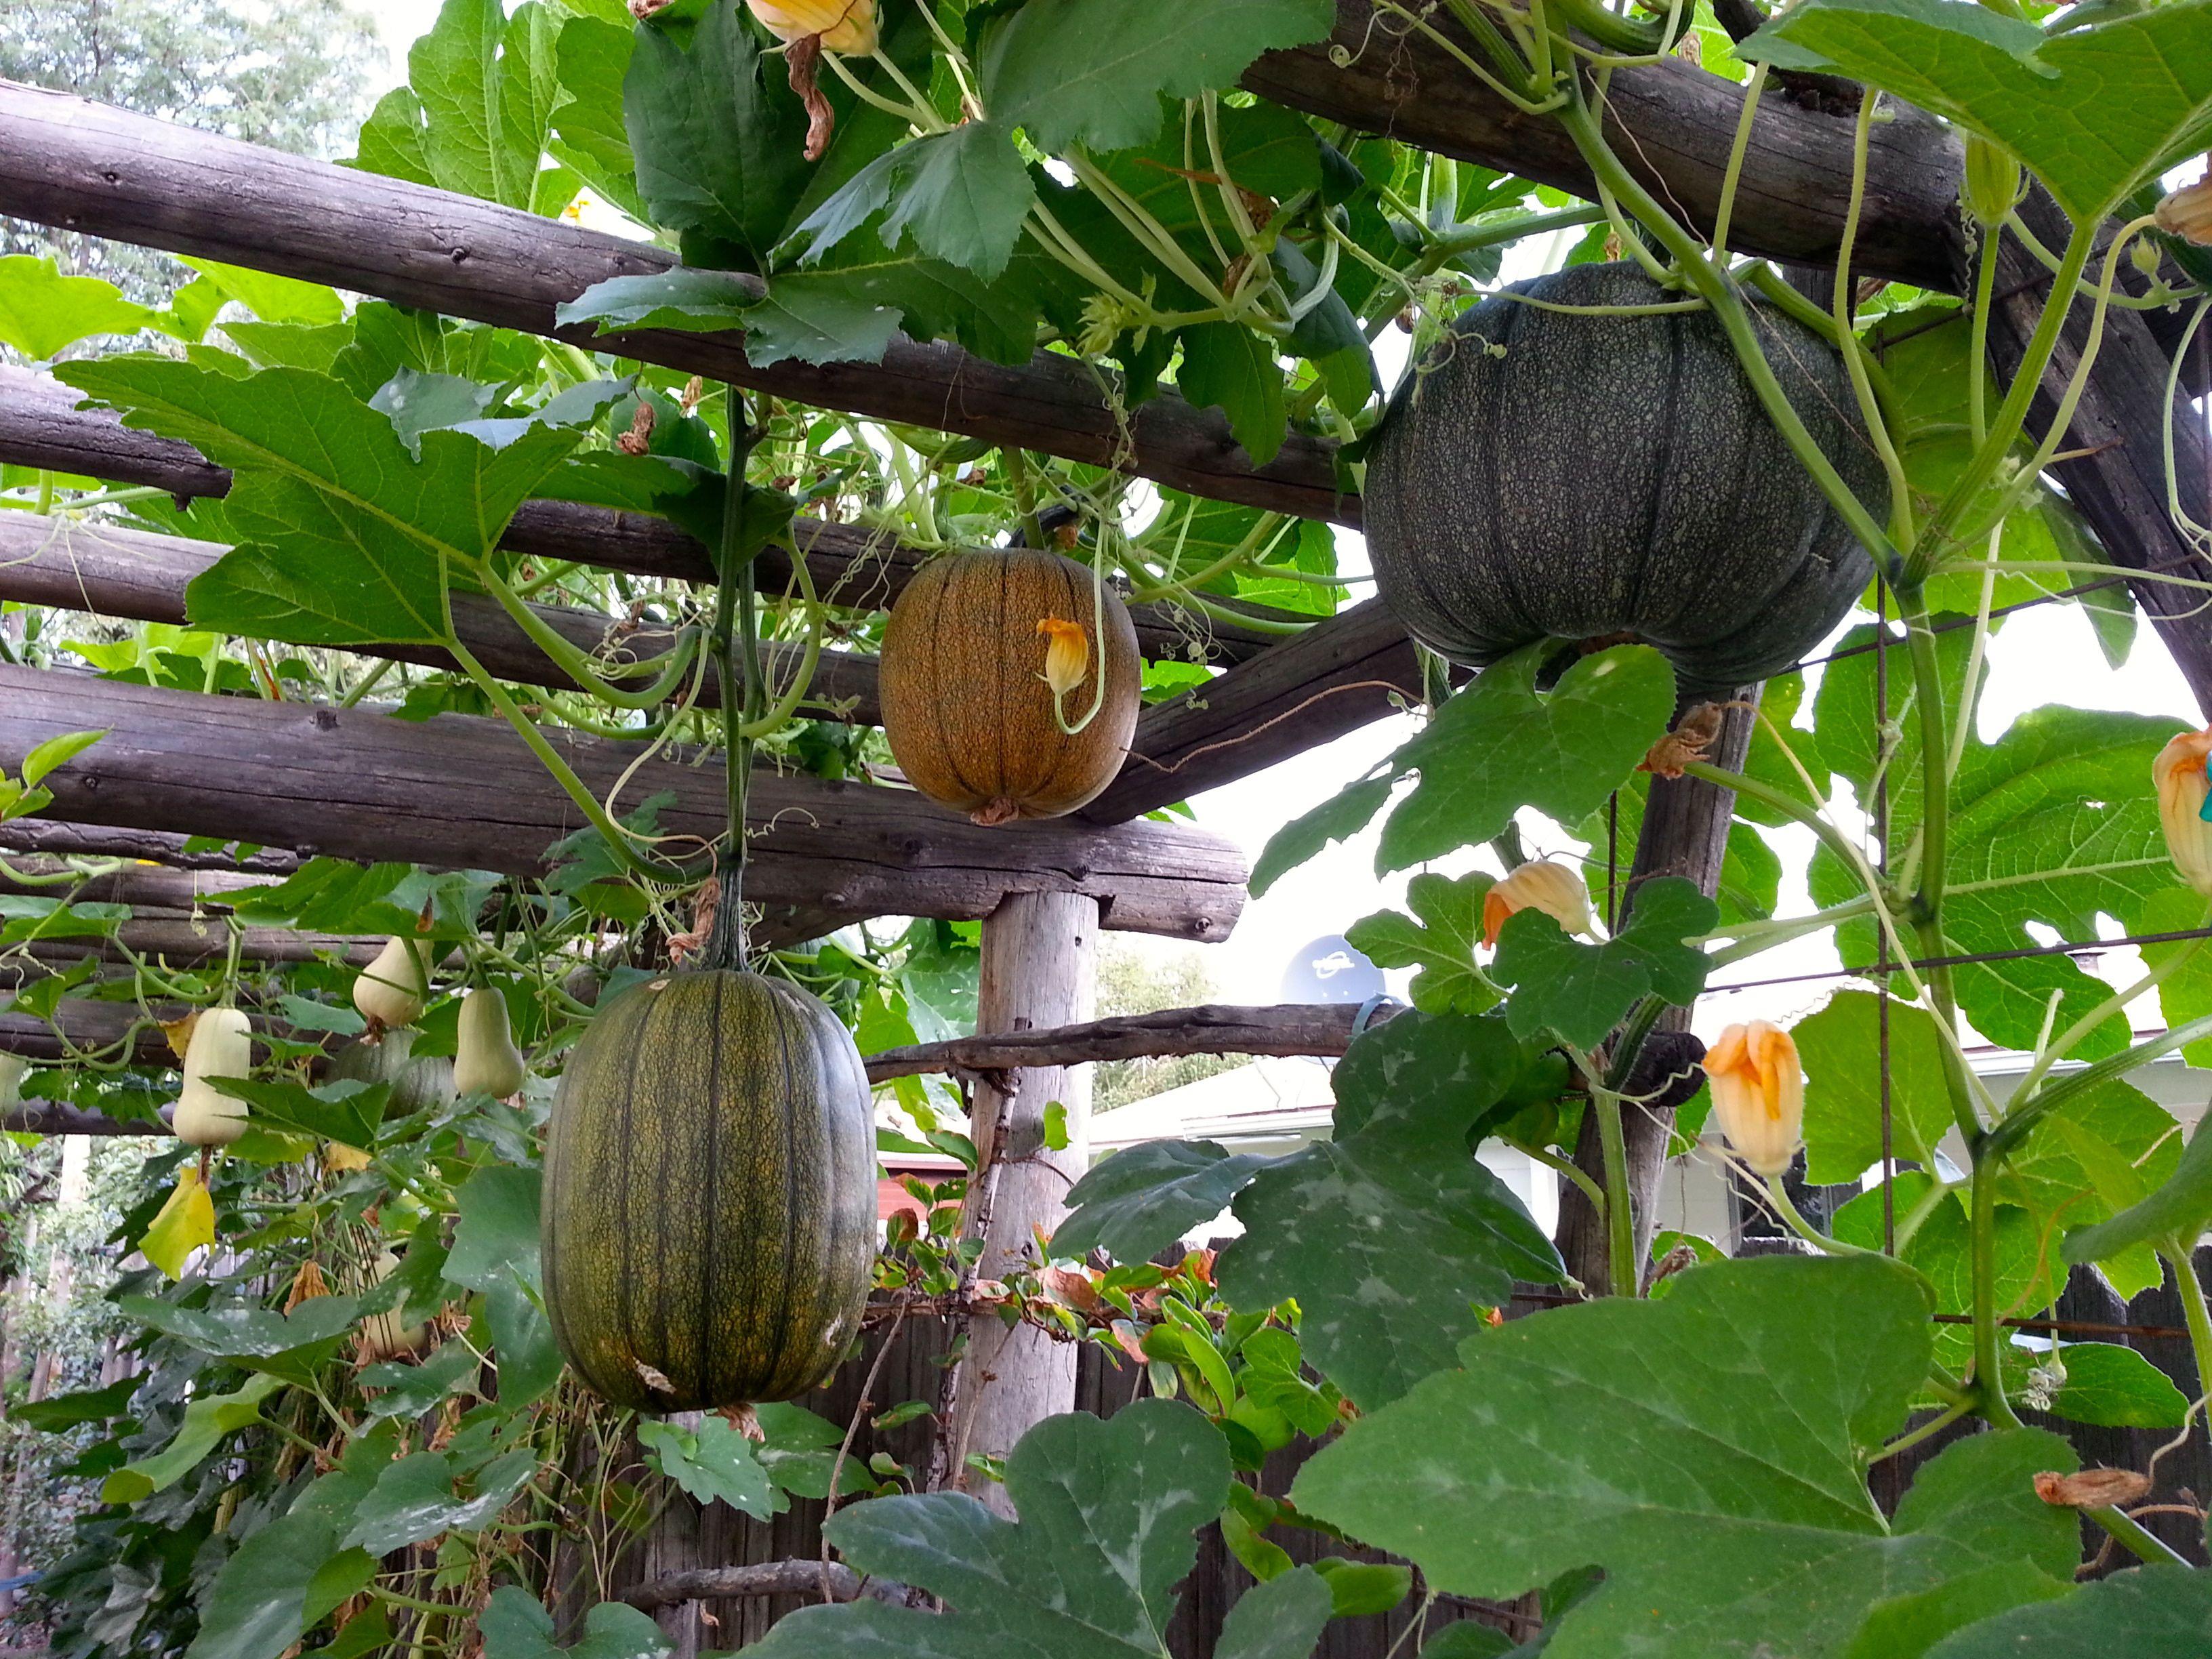 идеи посадки тыквы декоративной фото дерева